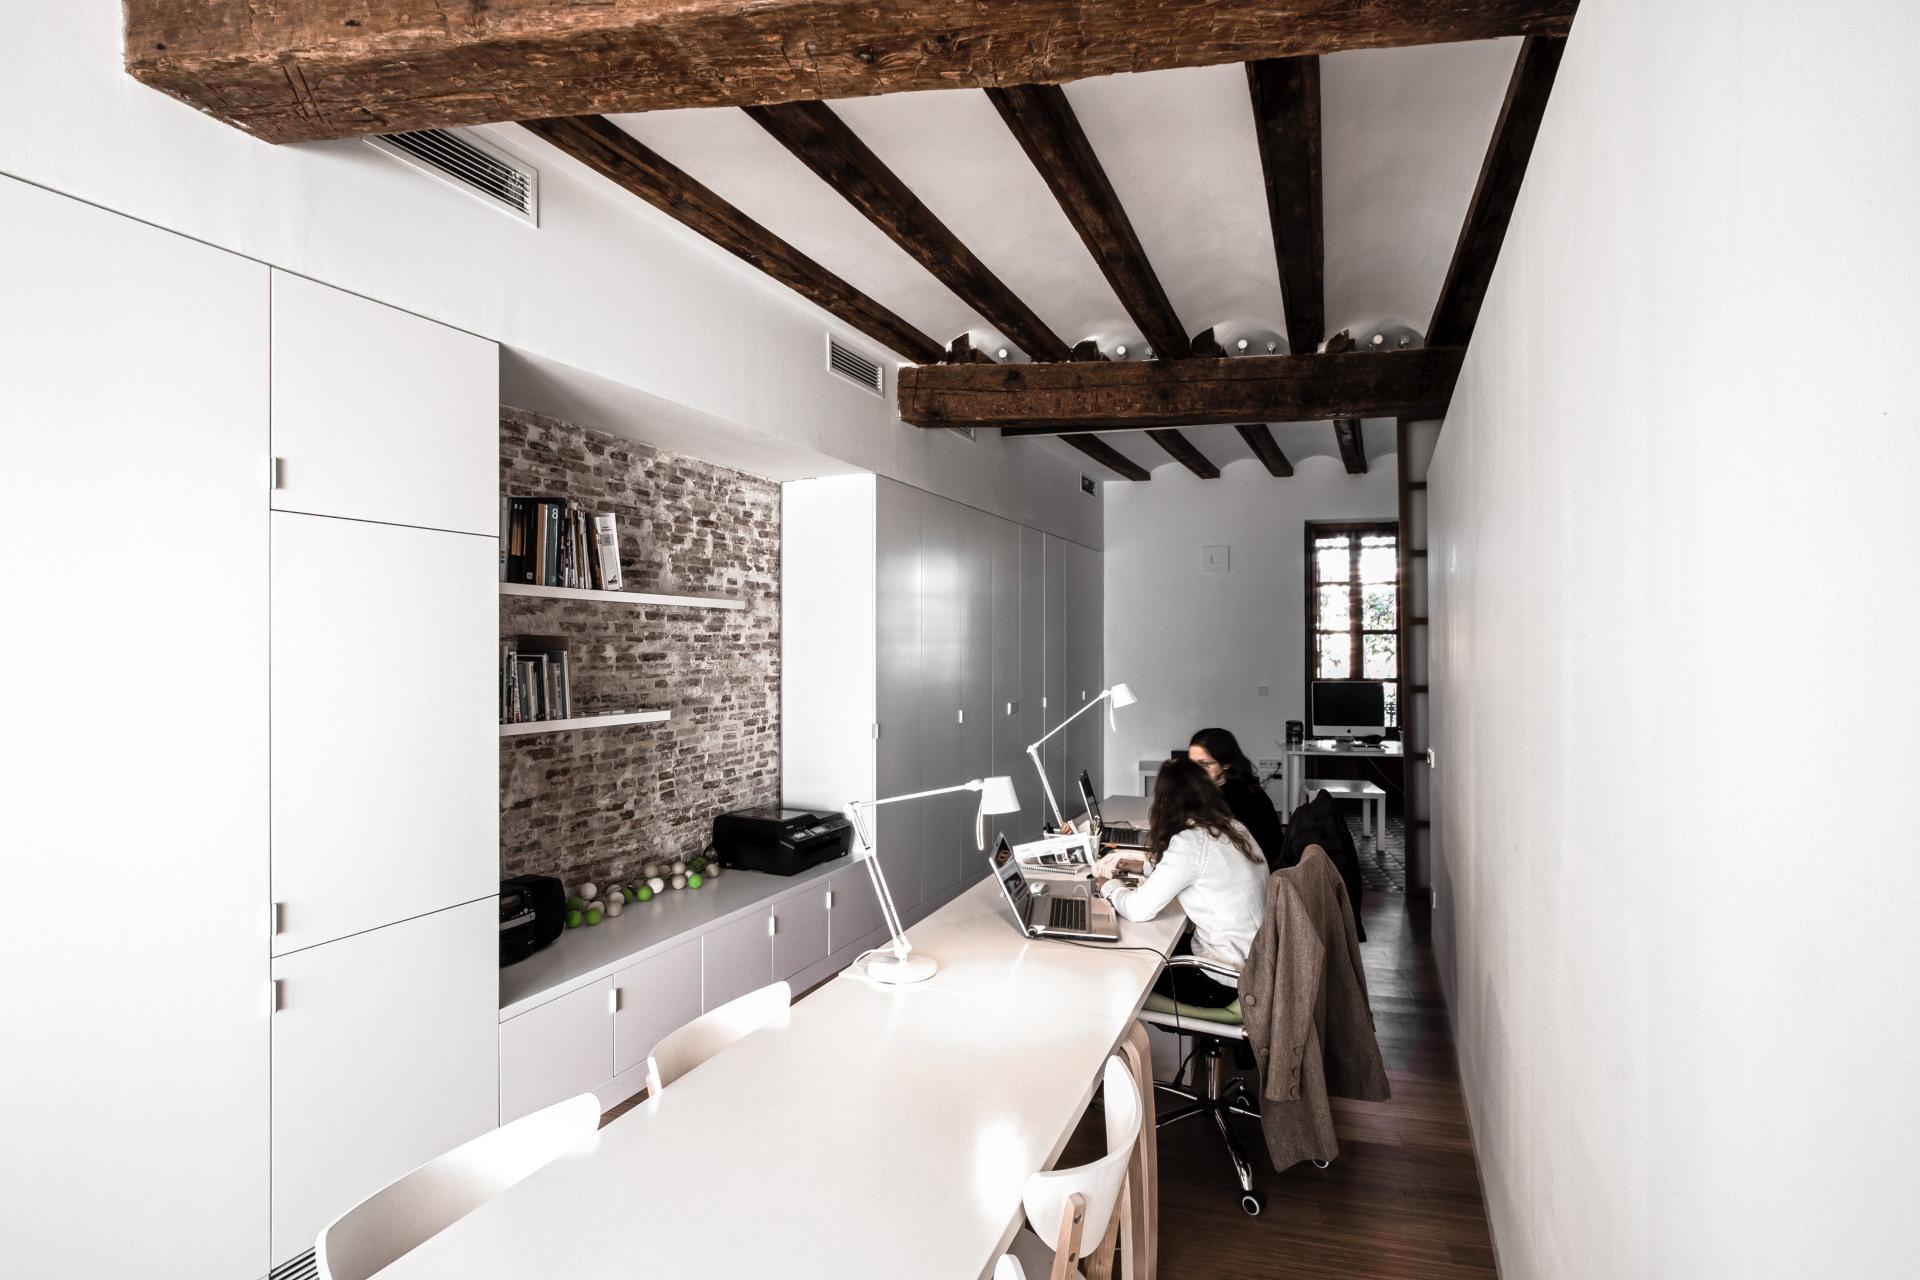 Estudio versea versea arquitectura y m s fotograf a - Fotografia arquitectura ...